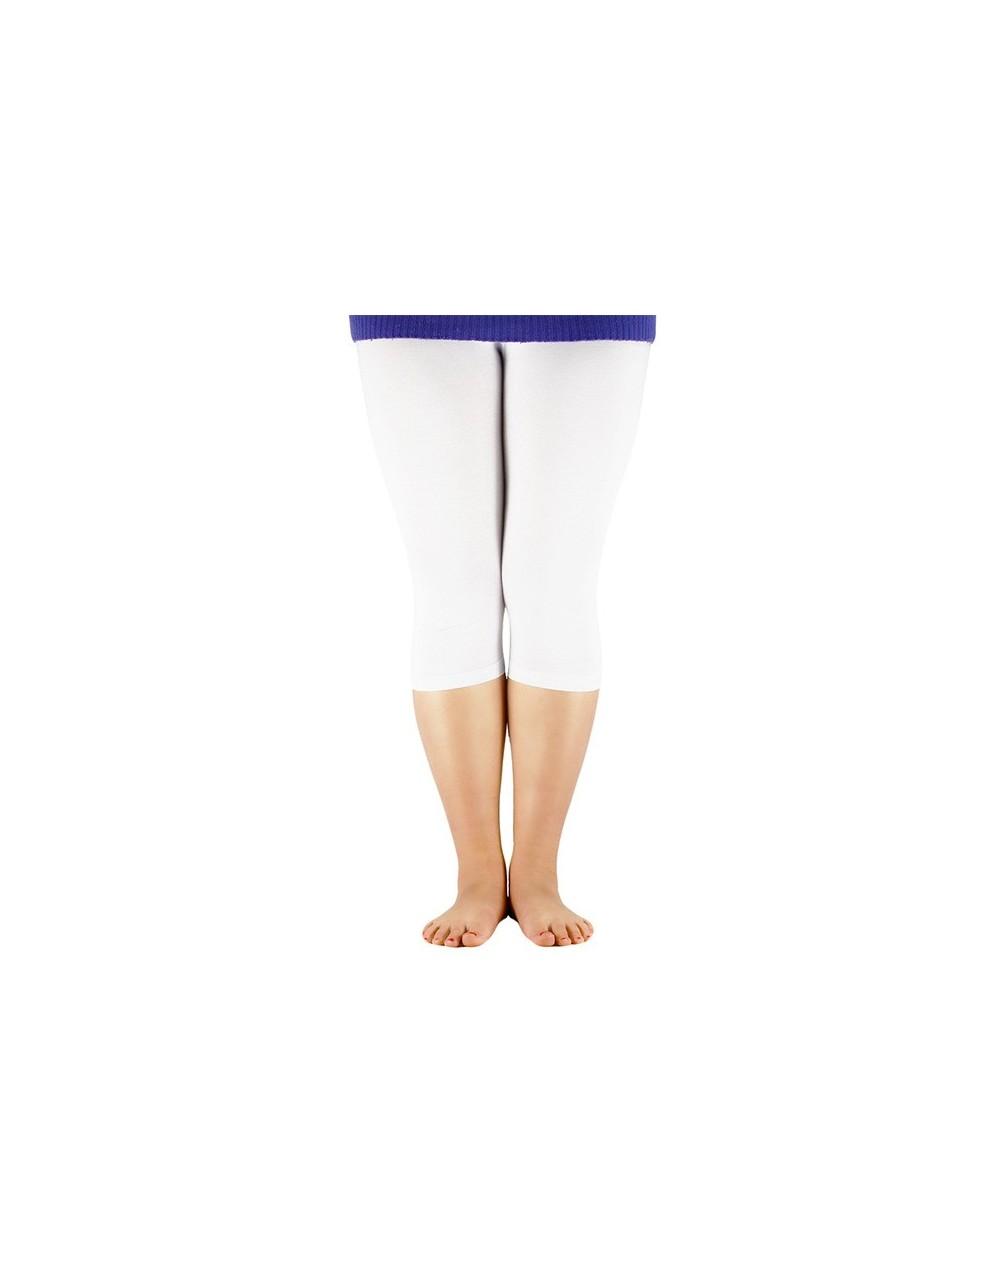 Women's 3/4 length Leggings Bamboo Fiber Plus Size Capri Legging High Stretchy Bumps Style Leggings Pants Basic Leggings - W...